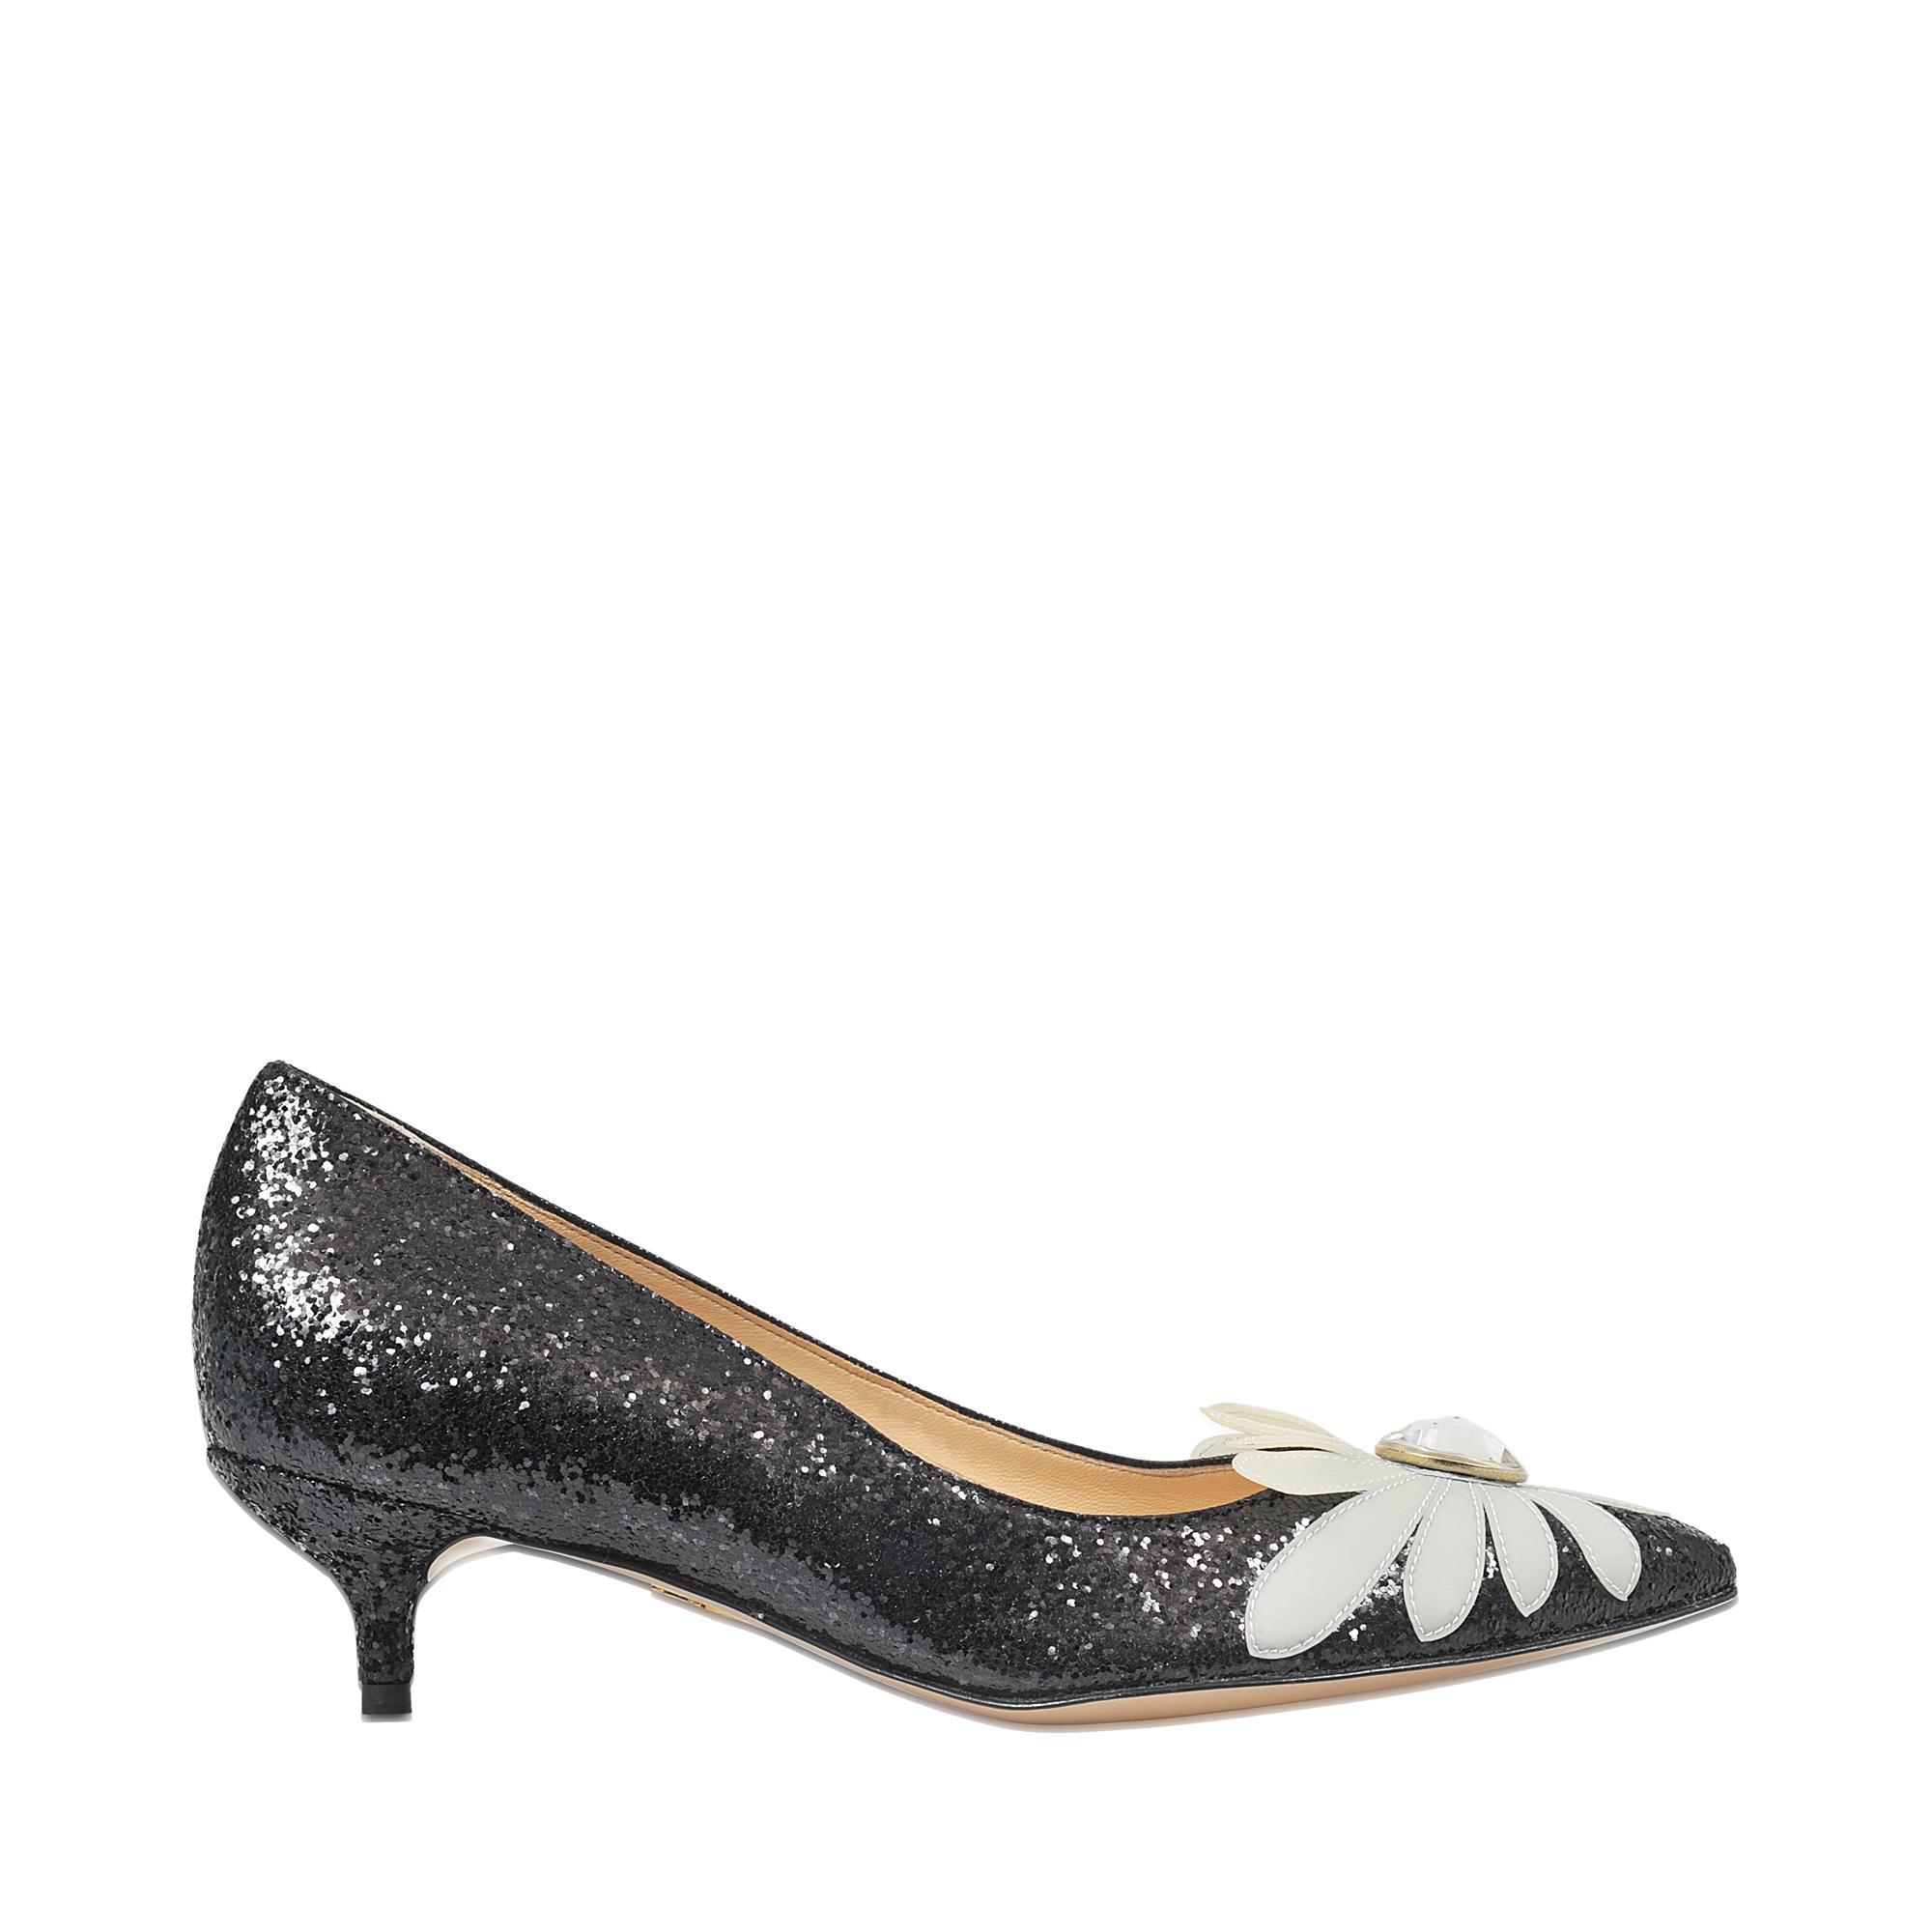 Miss Daisy glitter pump Charlotte Olympia nhBiHP2S